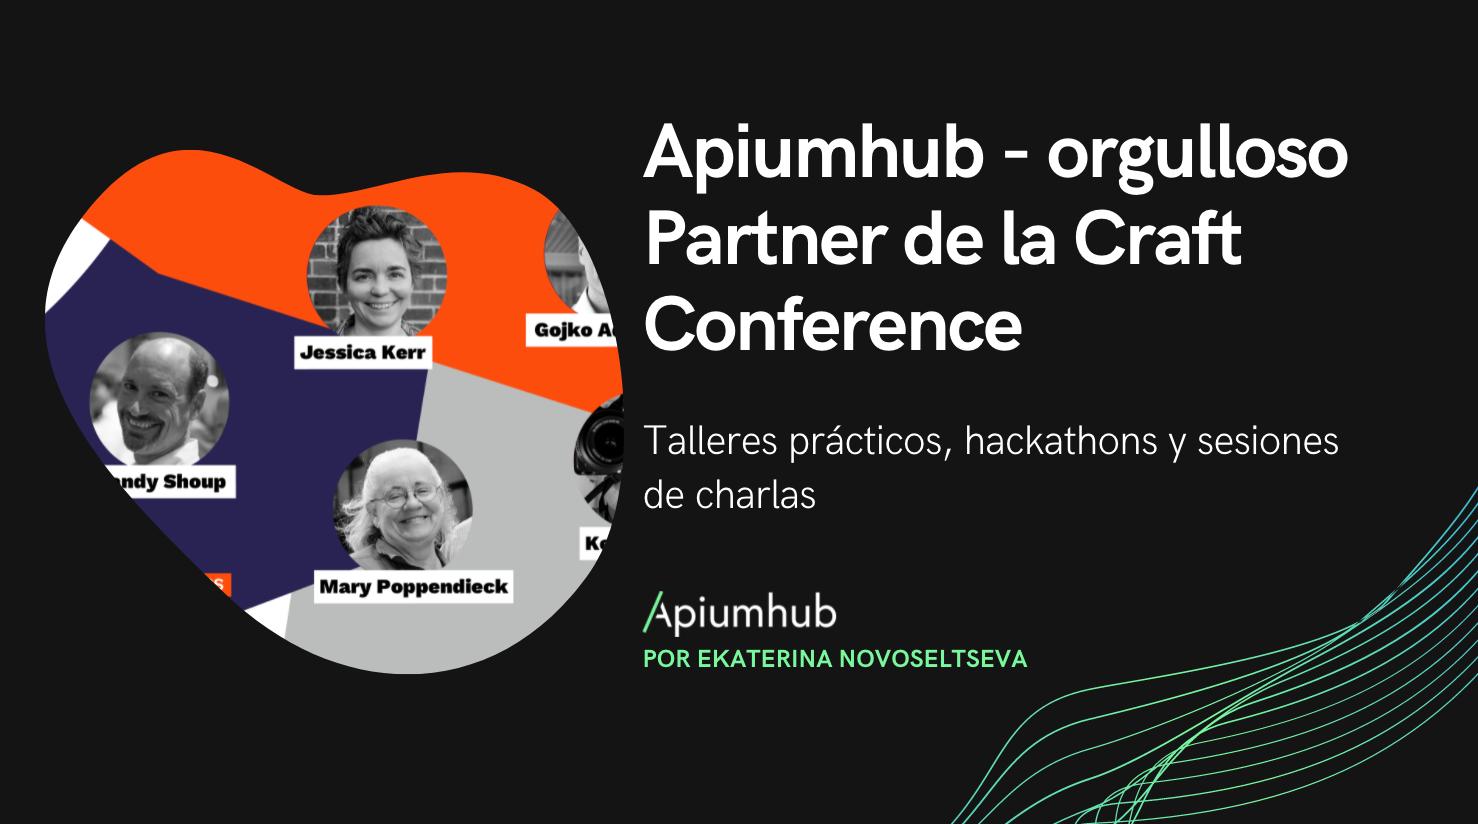 Apiumhub - orgulloso Partner de la Craft Conference